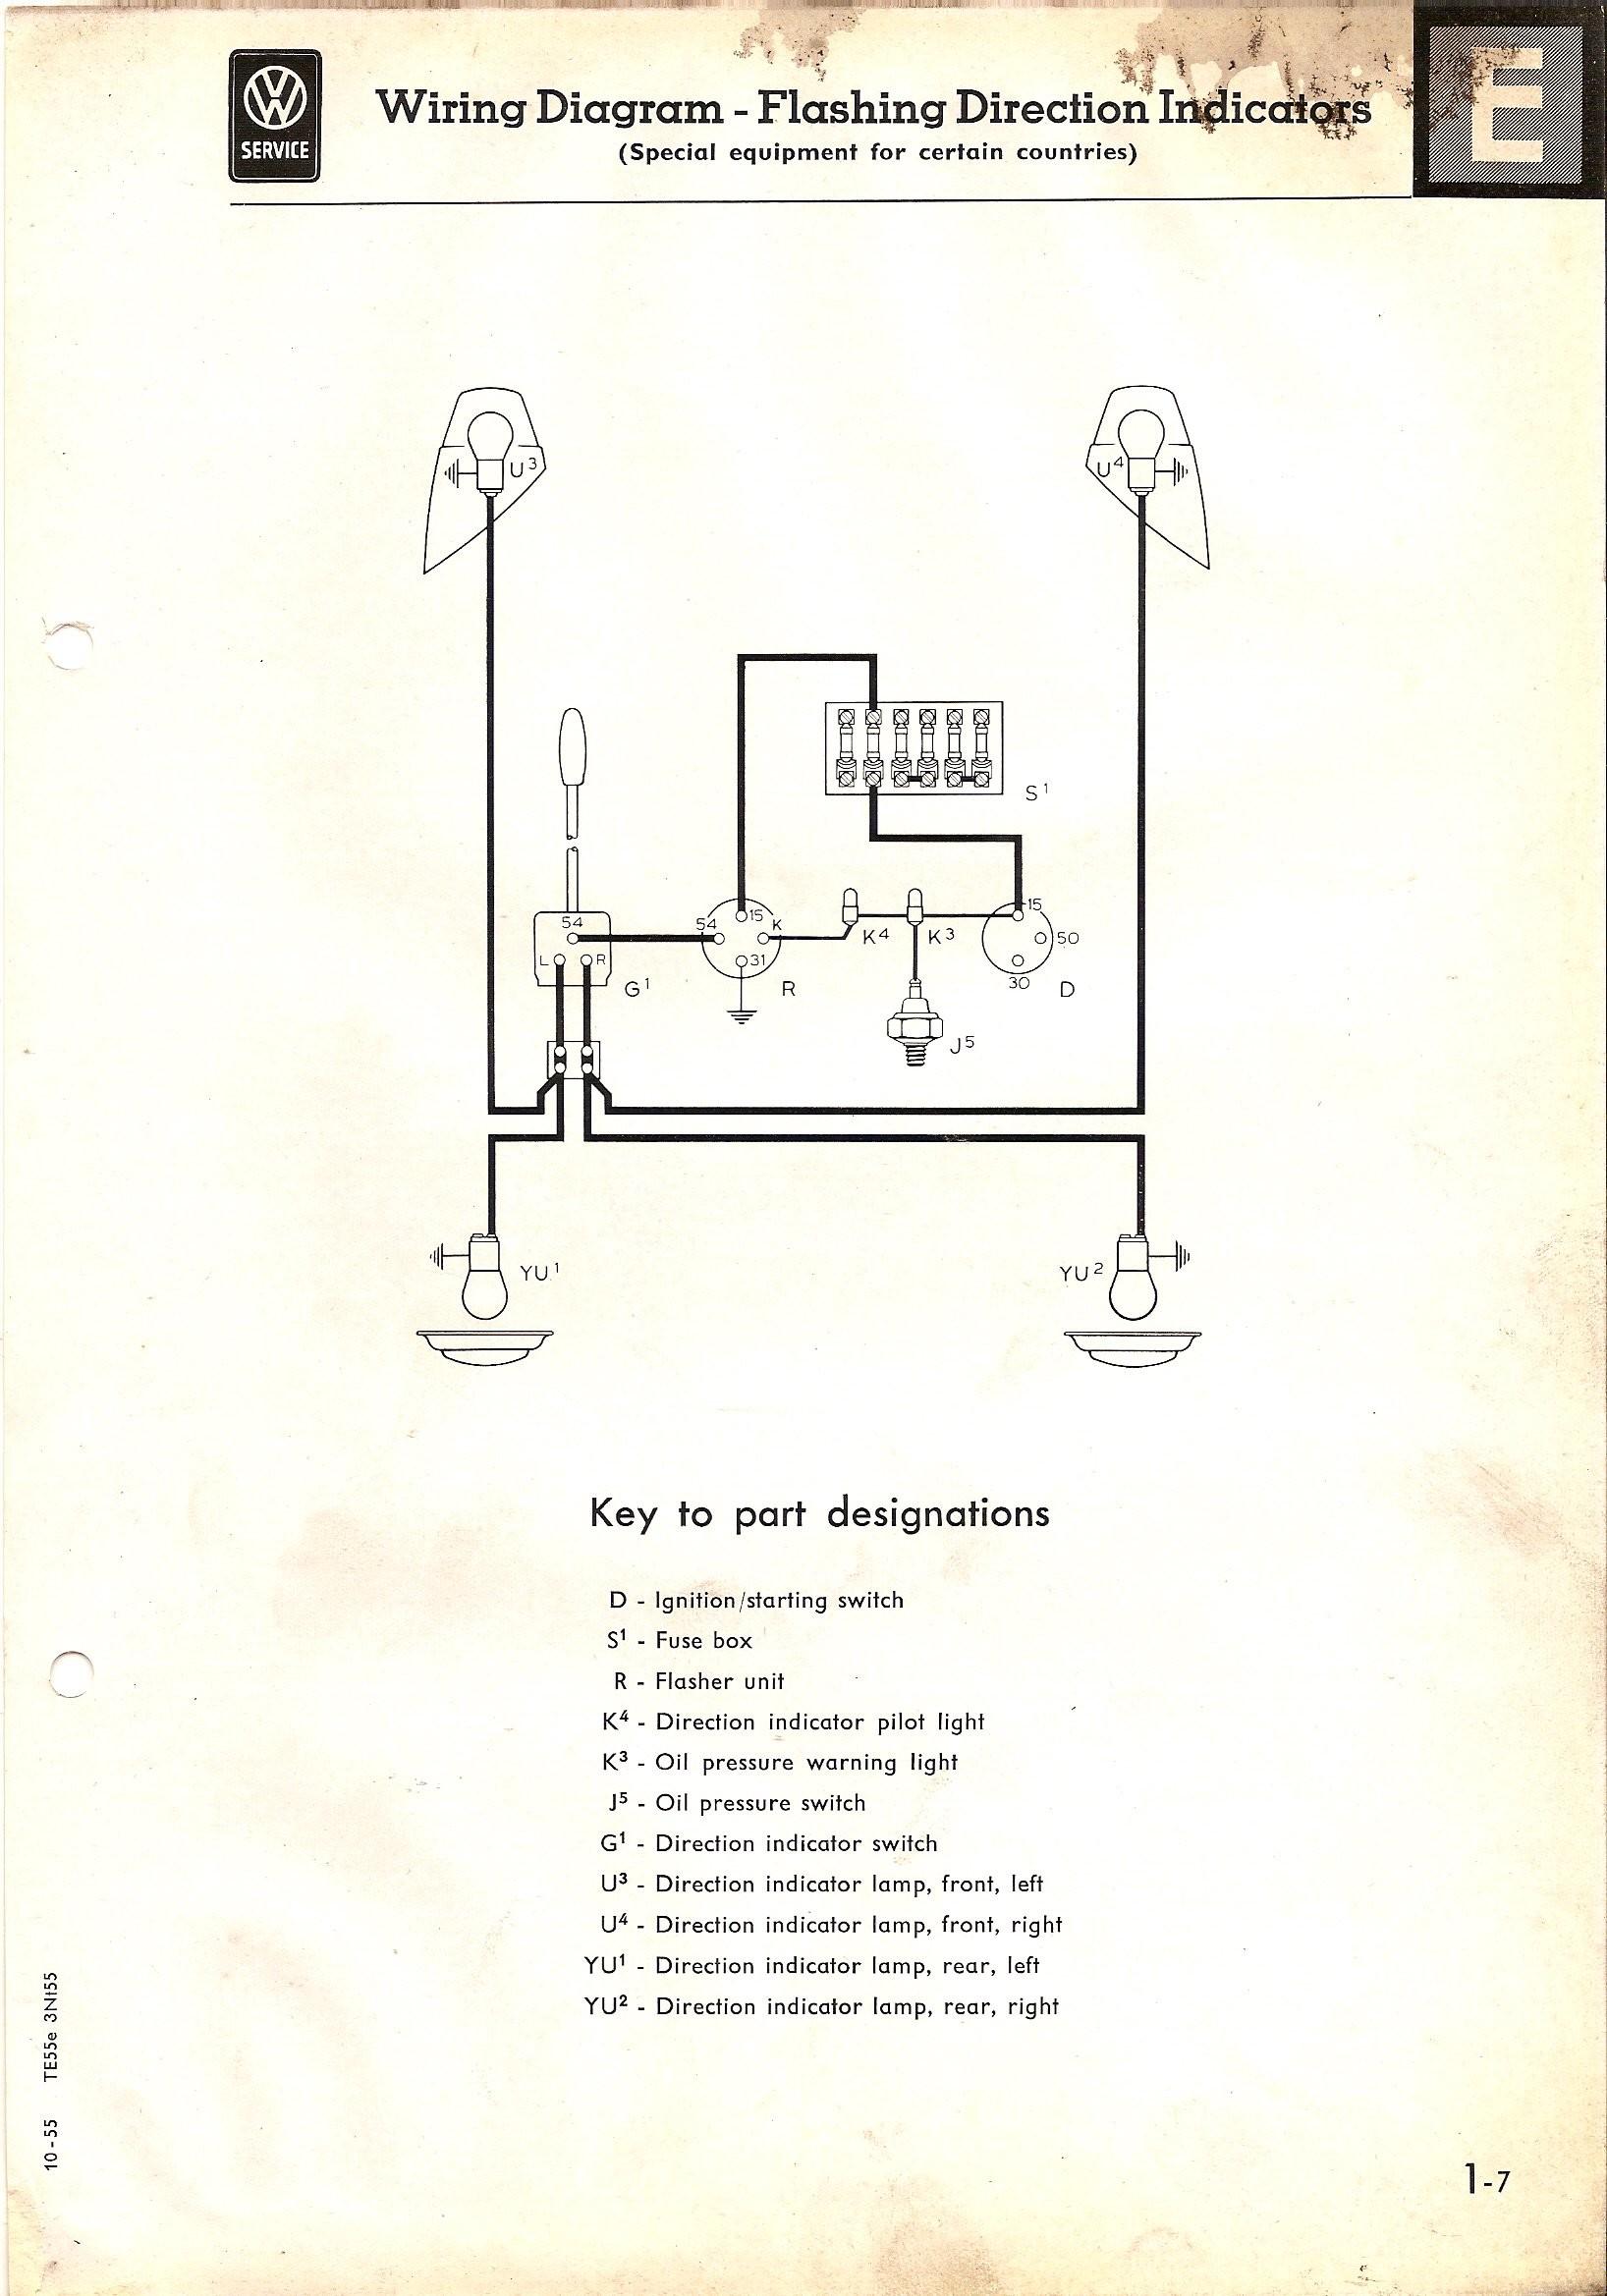 Wiring Diagram for Turn Signal Flasher thesamba Type 2 Wiring Diagrams Of Wiring Diagram for Turn Signal Flasher